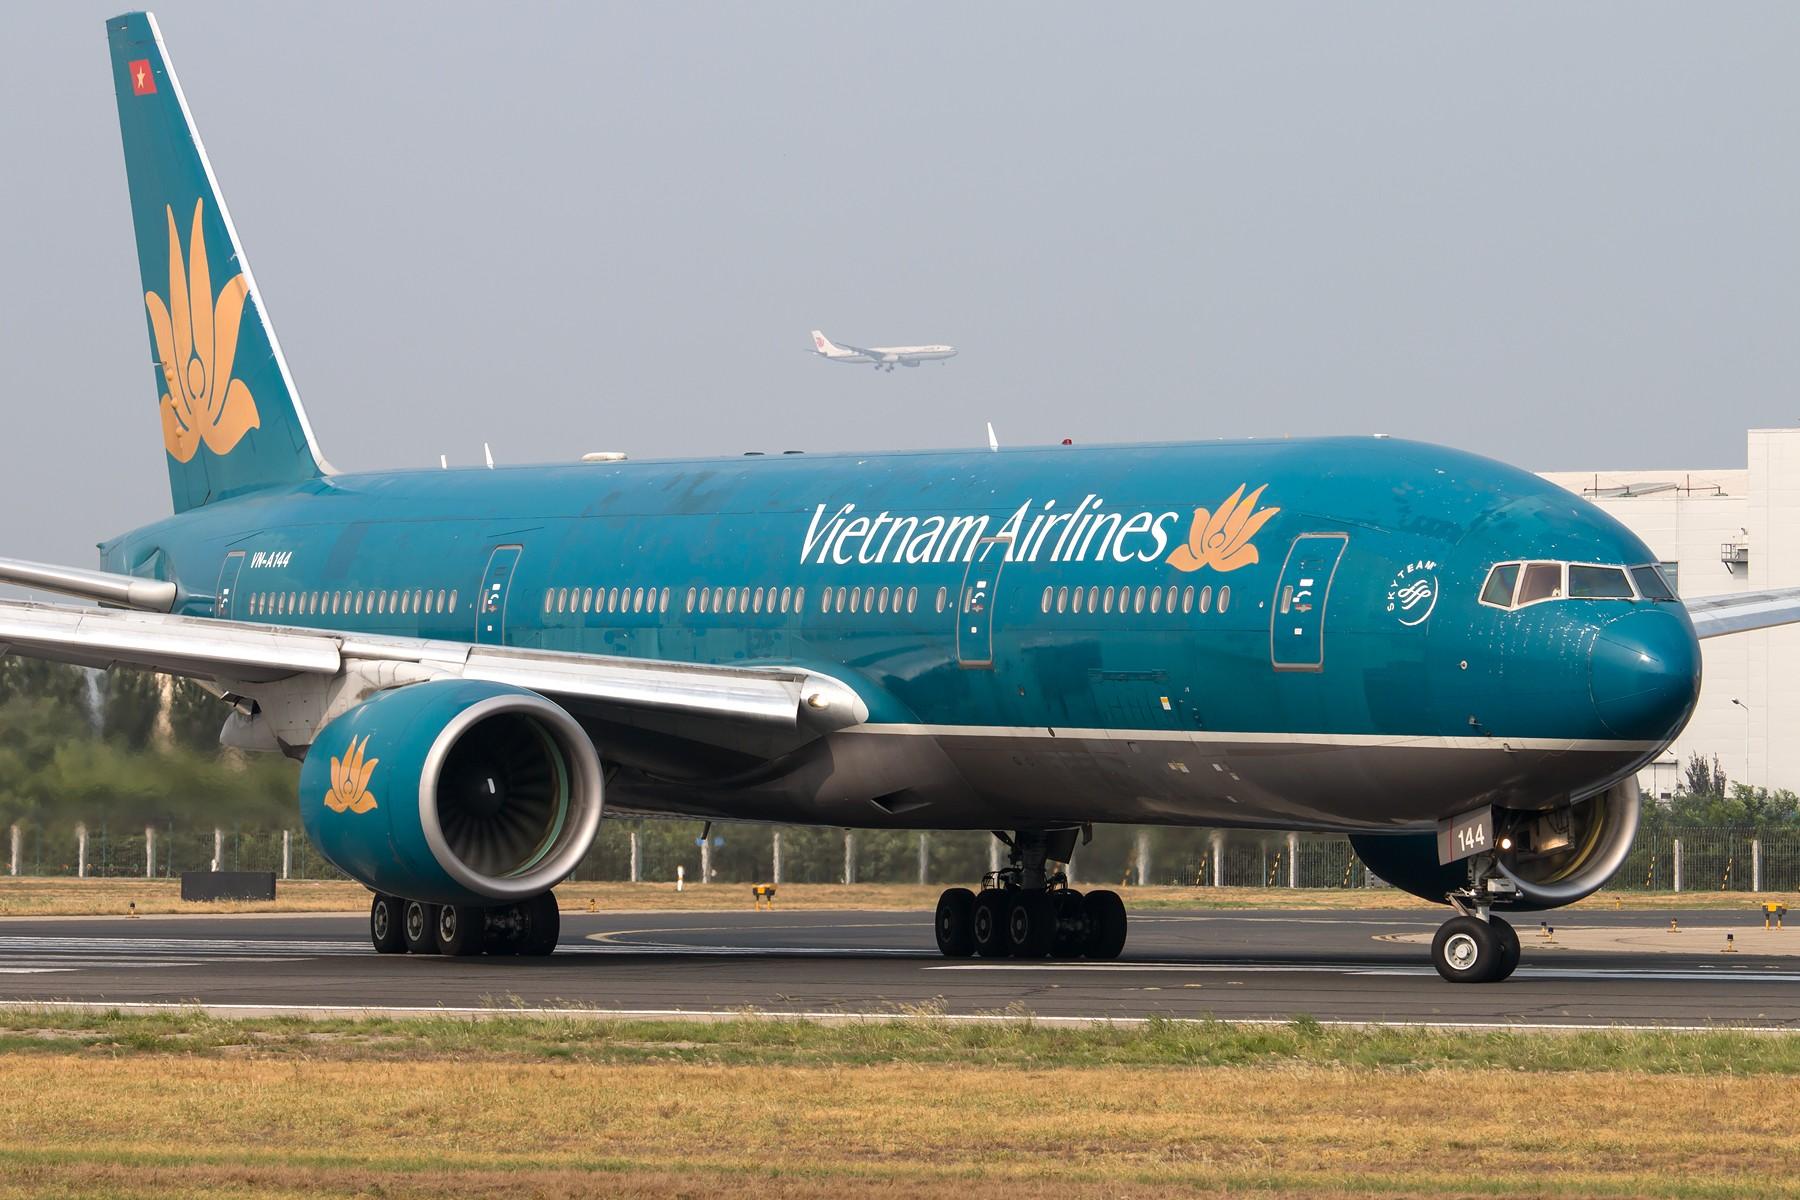 [一图党] Vietnam Airlines B777-200ER 1800*1200 BOEING B777-200ER VN-A144 中国北京首都国际机场